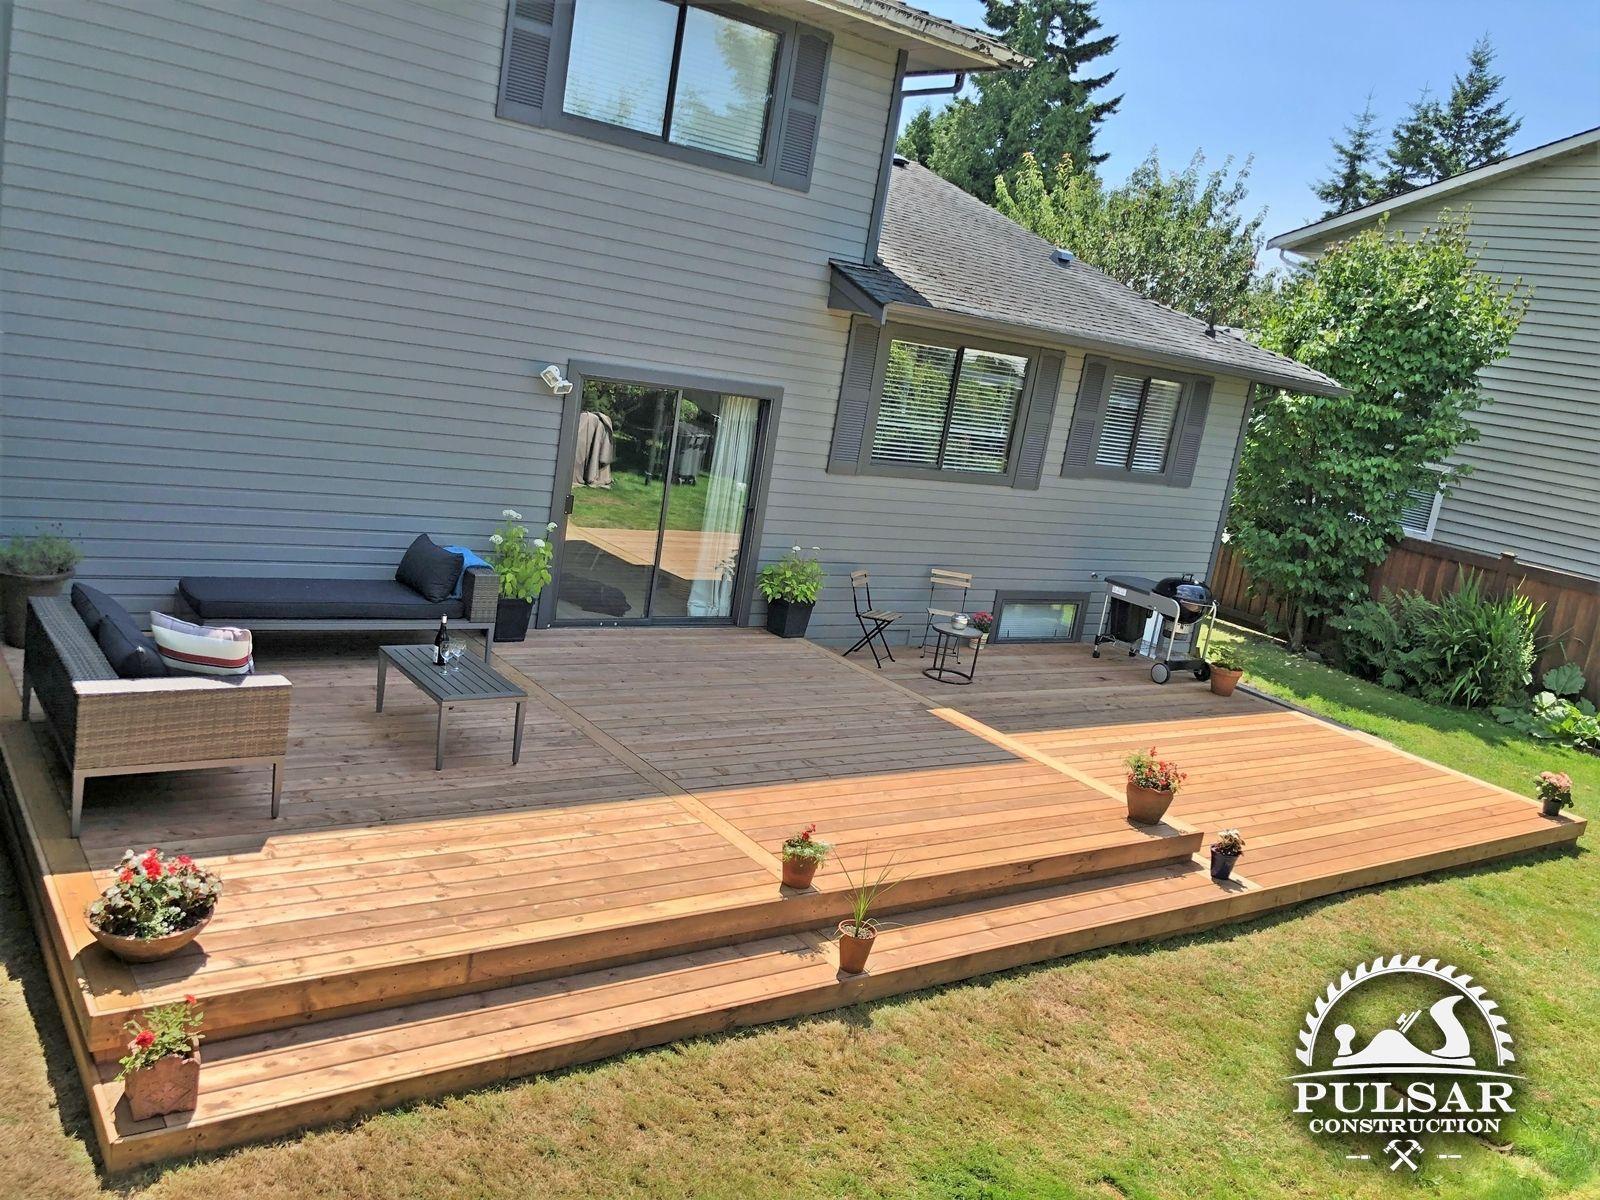 Split Level Patio Deck Modern Design Deck Designs Backyard Patio Deck Designs Patio Plans